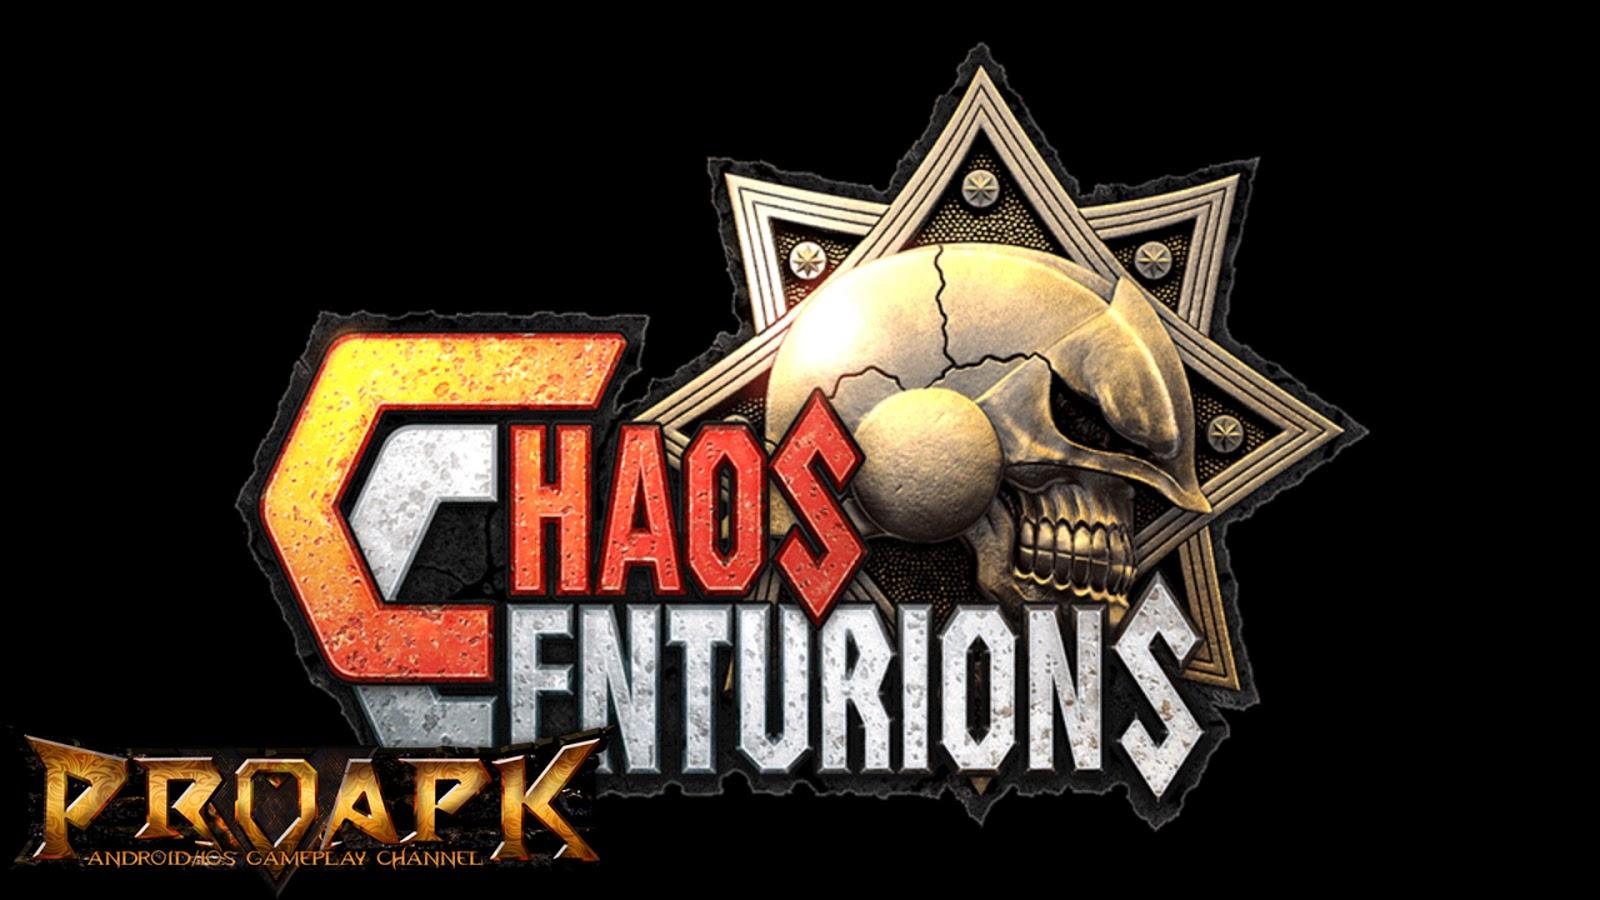 Chaos Centurions